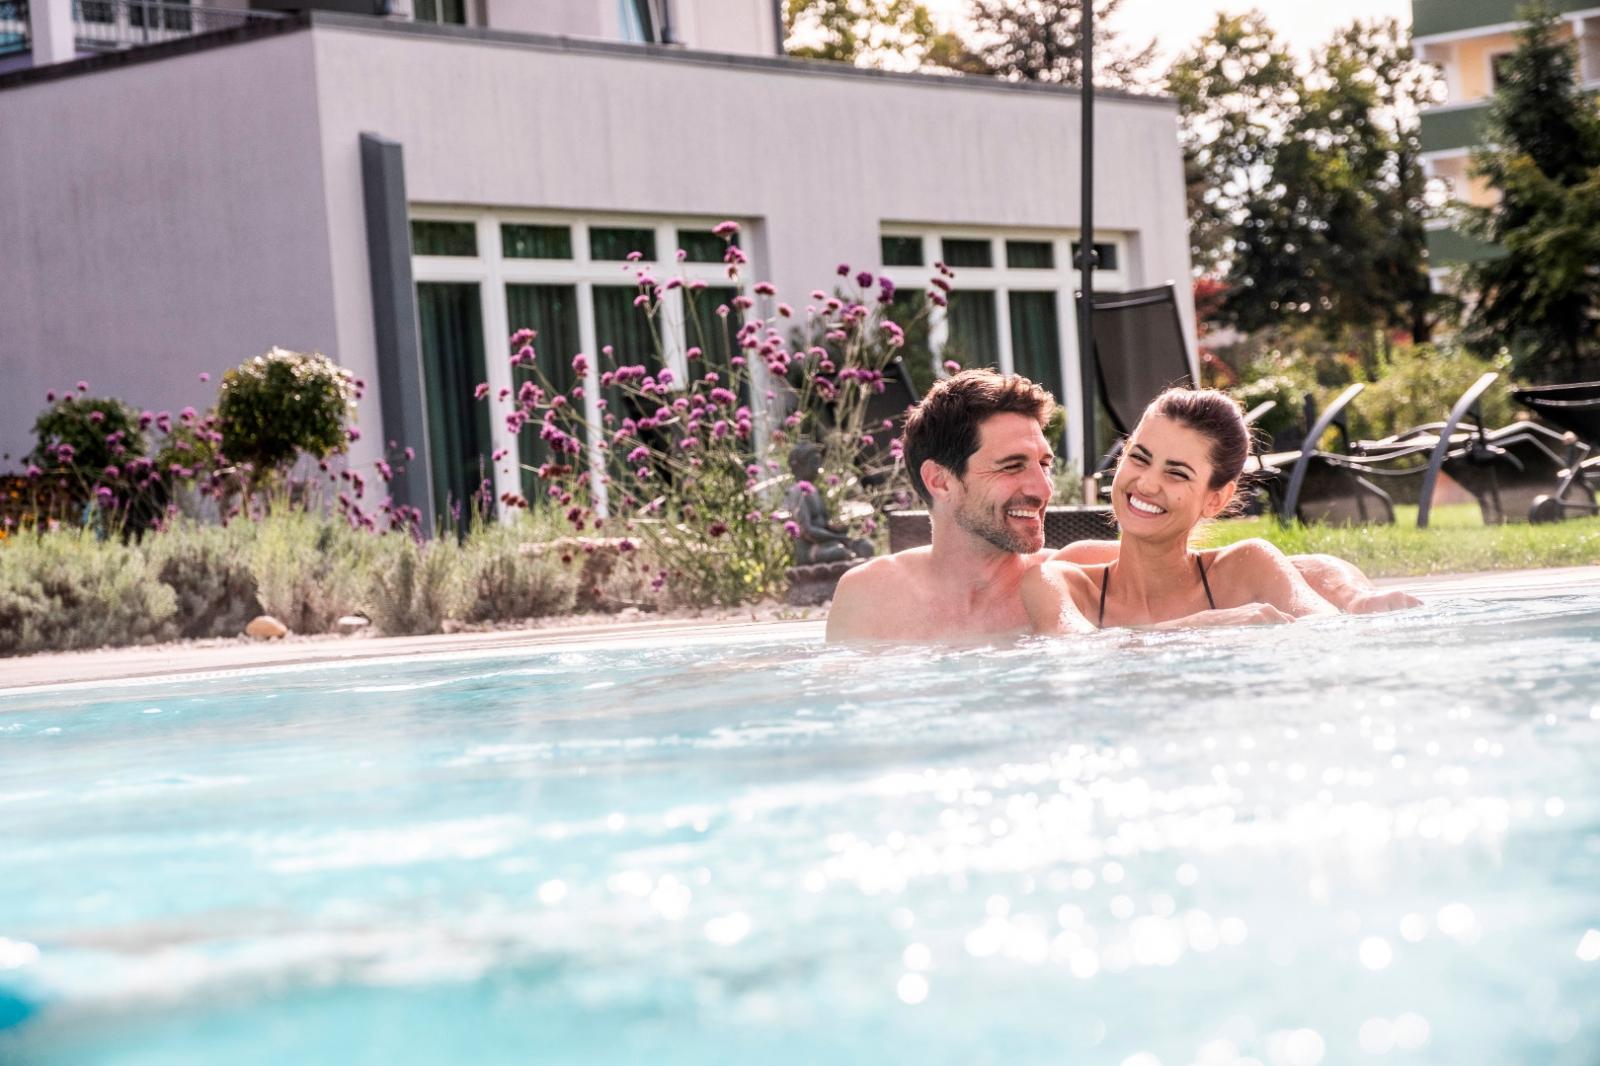 Danarium: Foto vom Wellnesshotel Hotel Holzapfel | Wellness Bayern